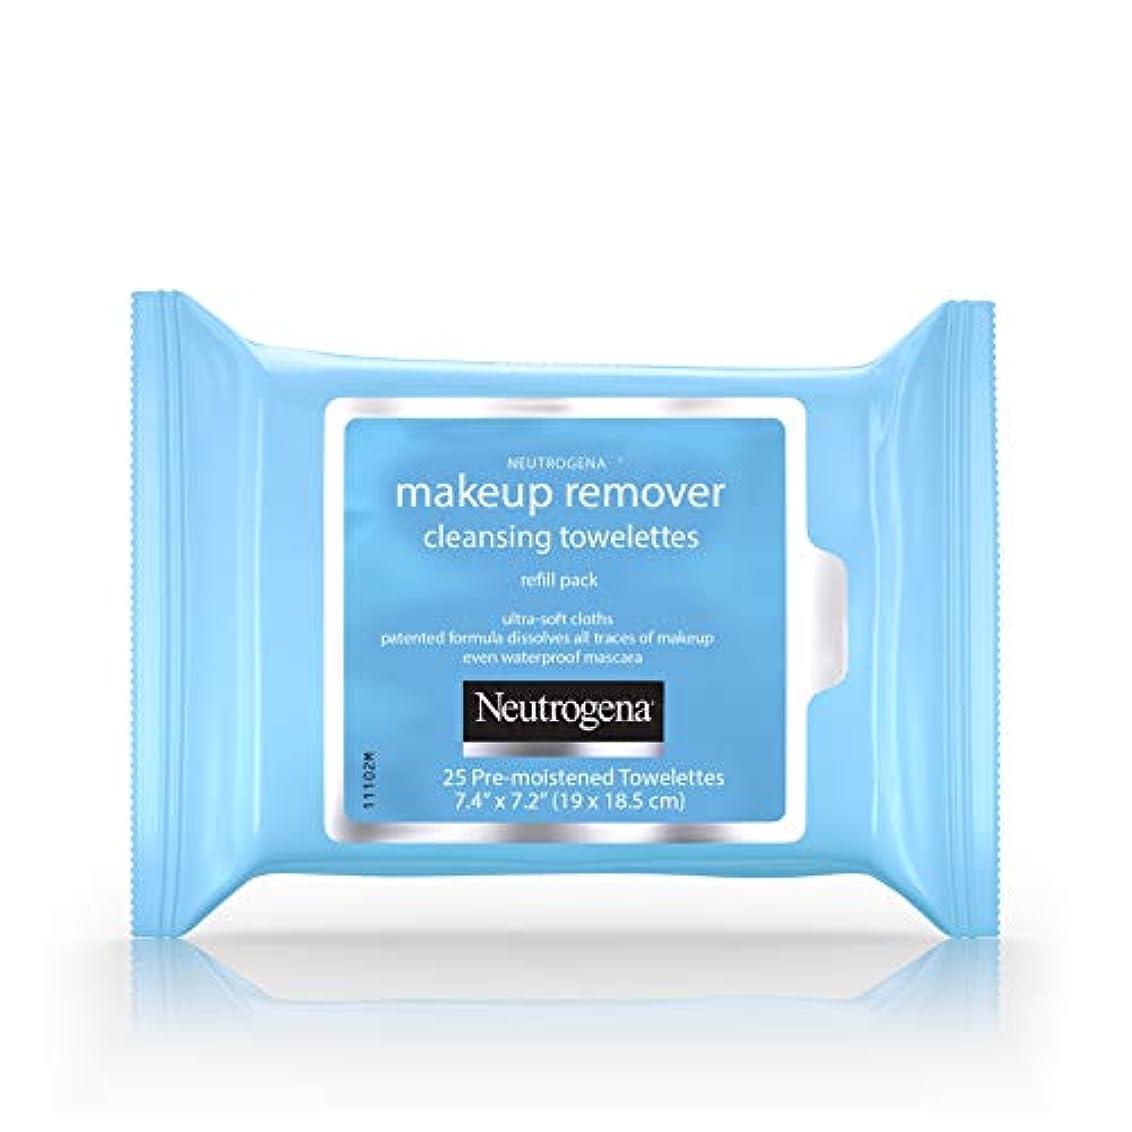 愛情責任密輸Neutrogena Make-up Remover Cleansing Towelettes Refill Pack 25 Pc (並行輸入品)